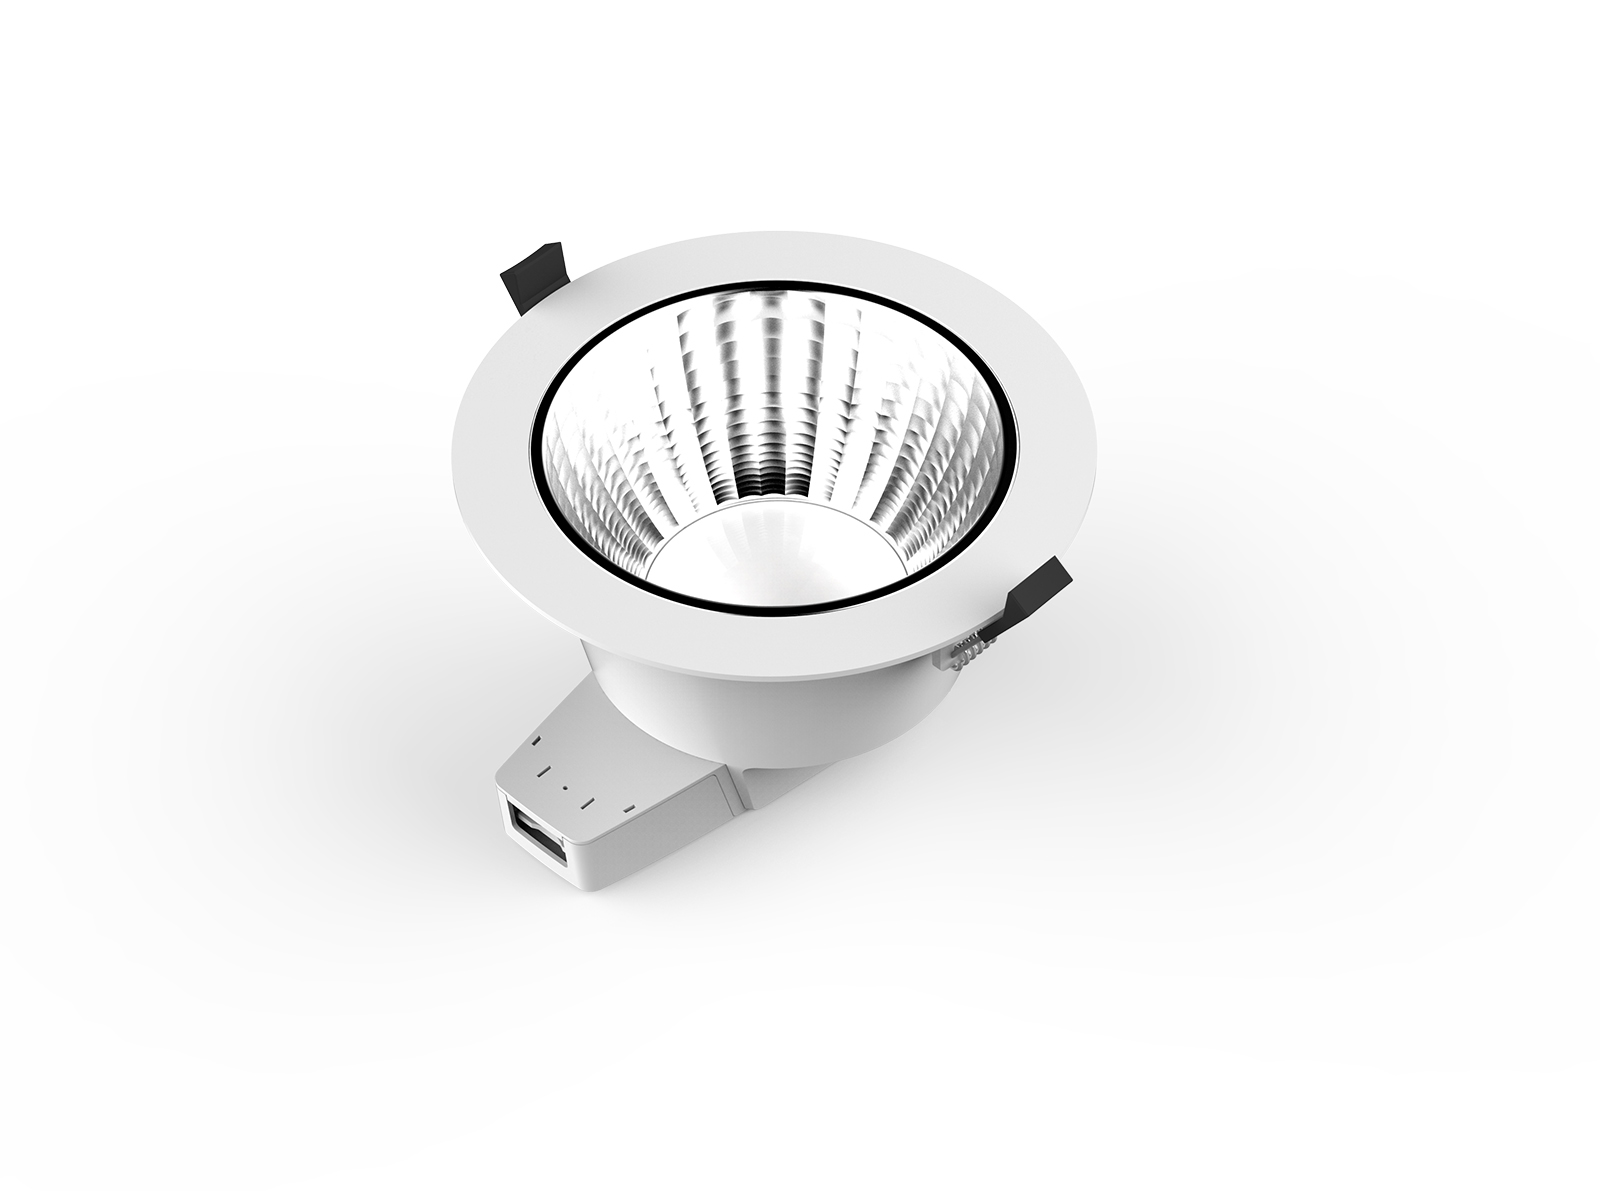 Led 6 Inch Recessed Downlight Upshine Lighting Wiring Diagram 277v